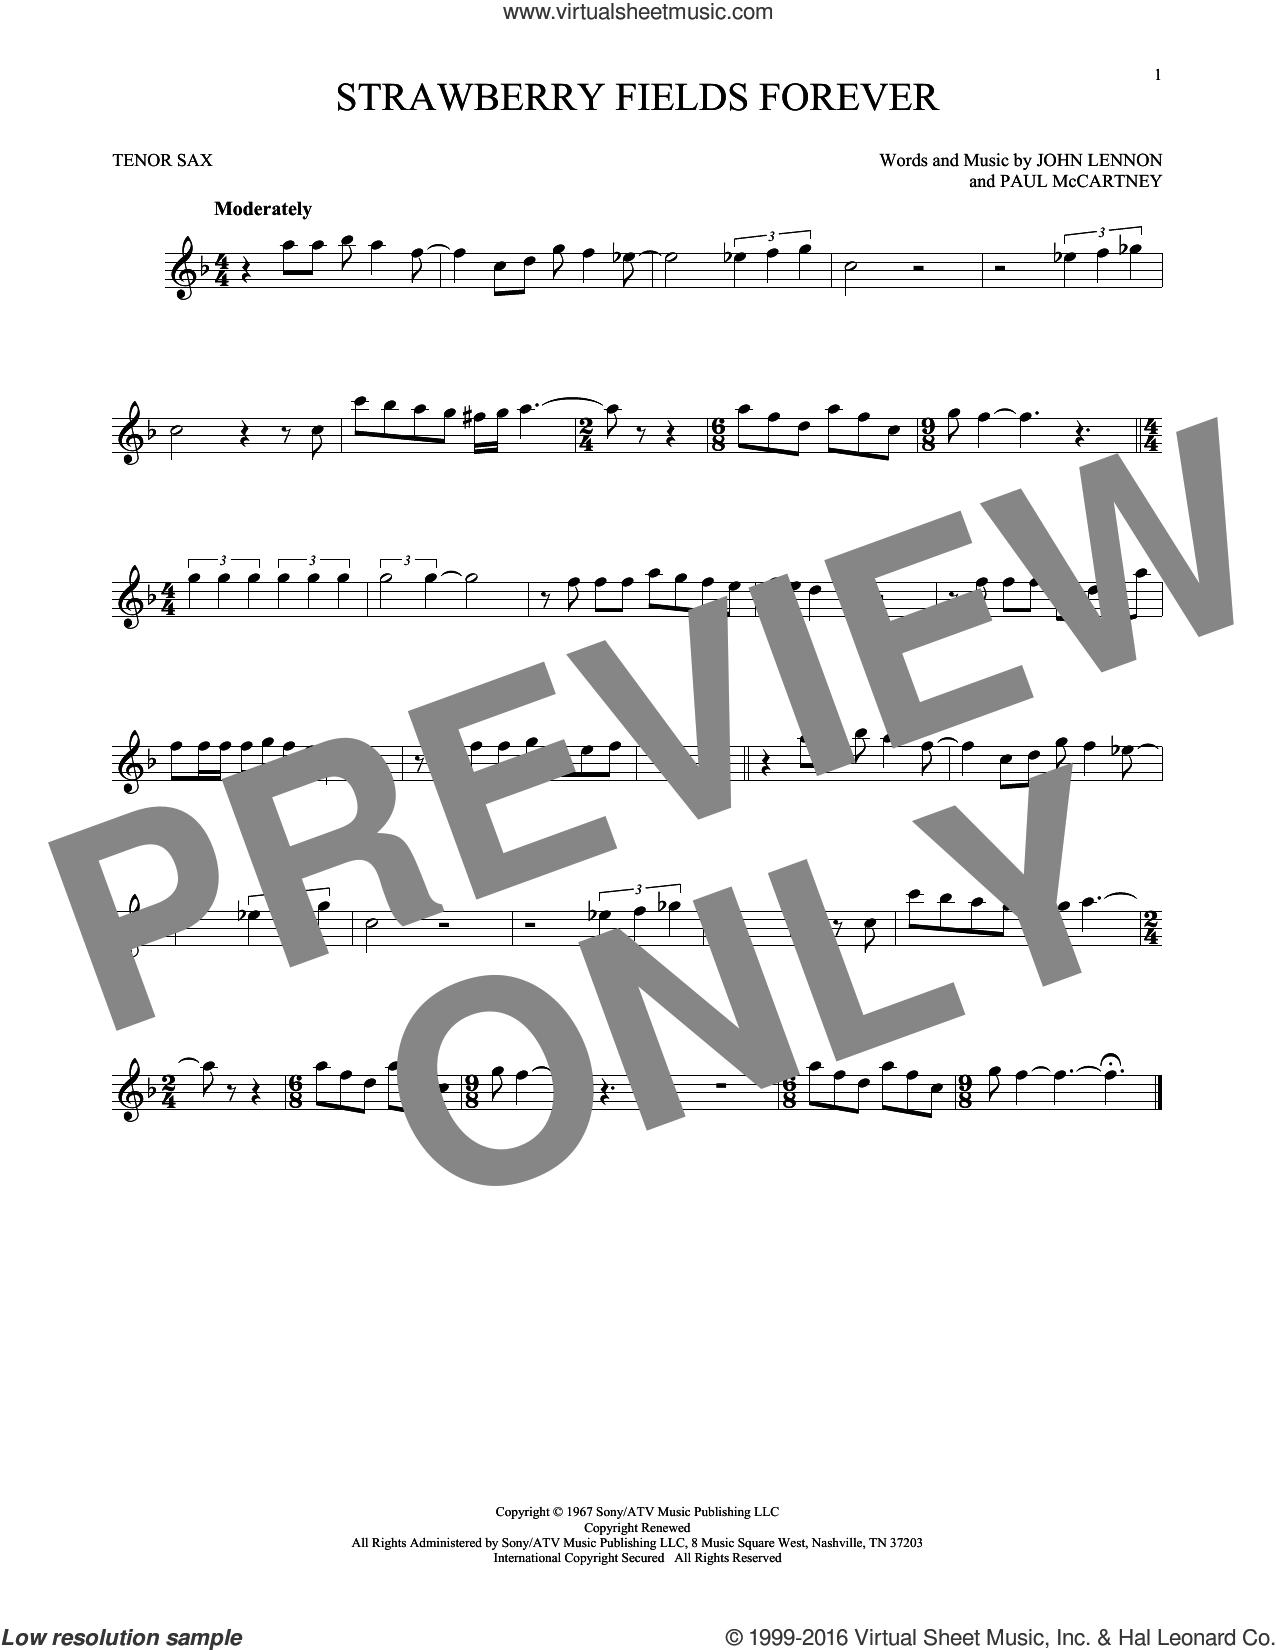 Strawberry Fields Forever sheet music for tenor saxophone solo by The Beatles, John Lennon and Paul McCartney, intermediate skill level